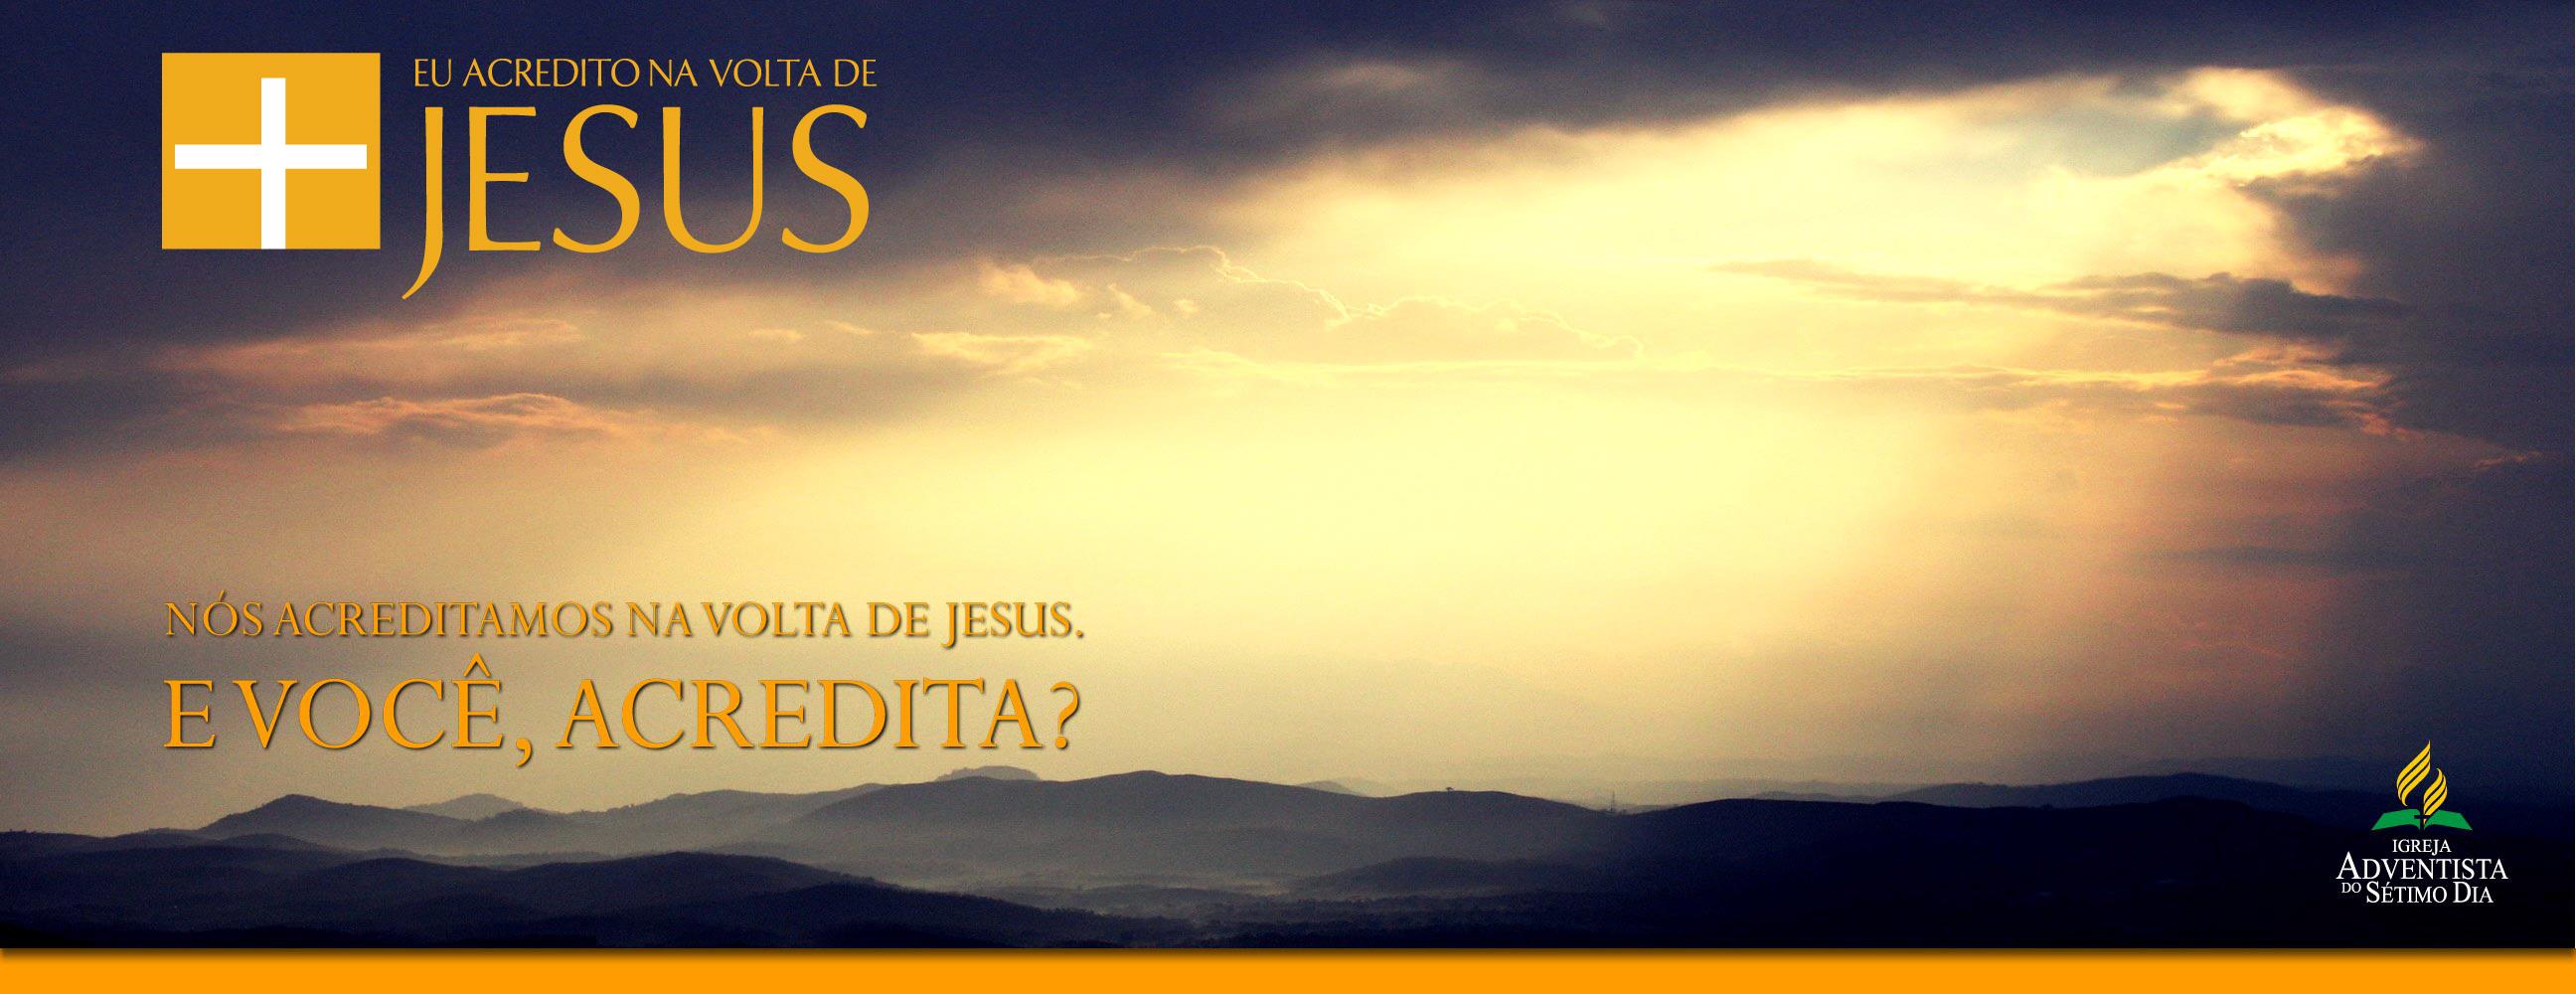 Eu Acredito na Volta de Jesus